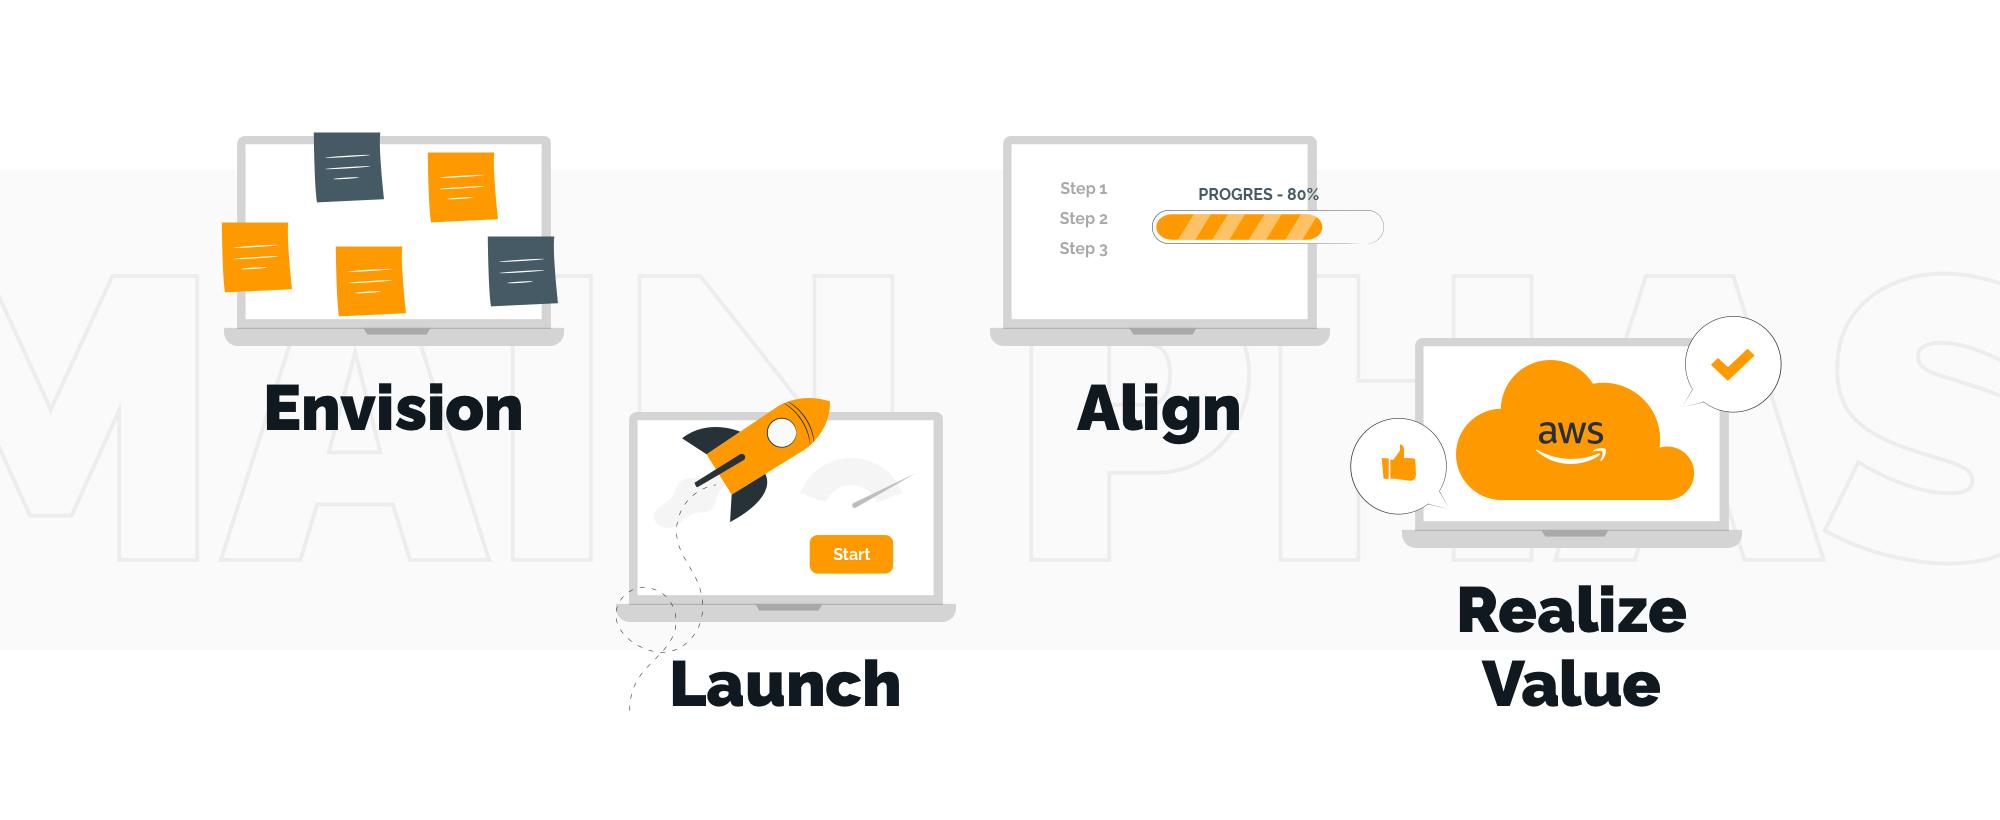 AWS Cloud Adoption Framework Overview: Main Phases | TechMagic